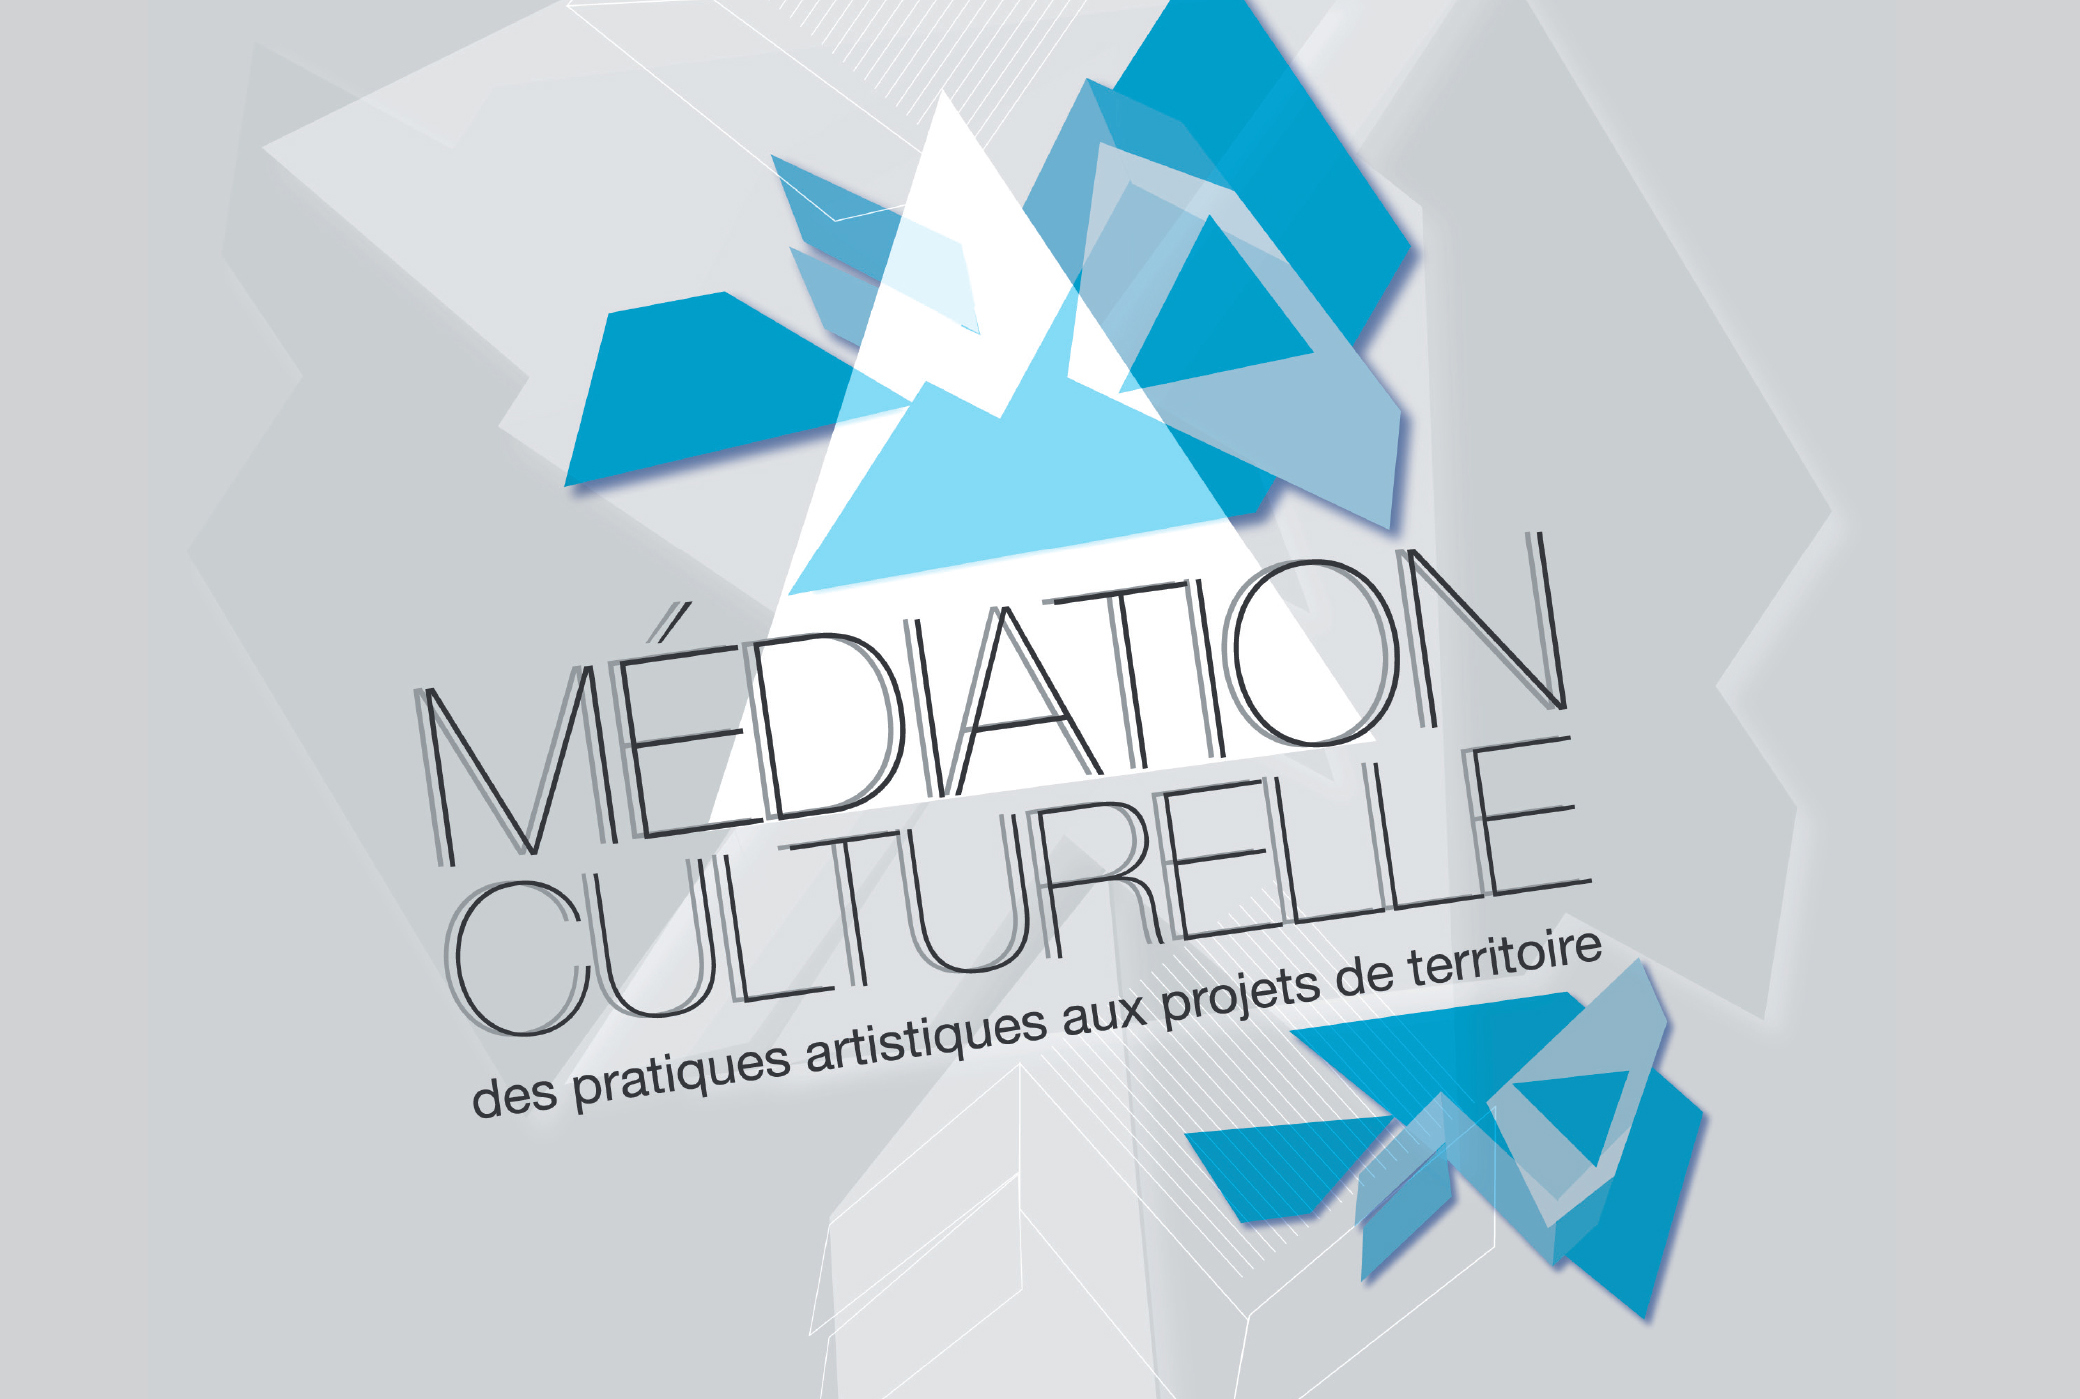 formation professionnelle mediation culturelle